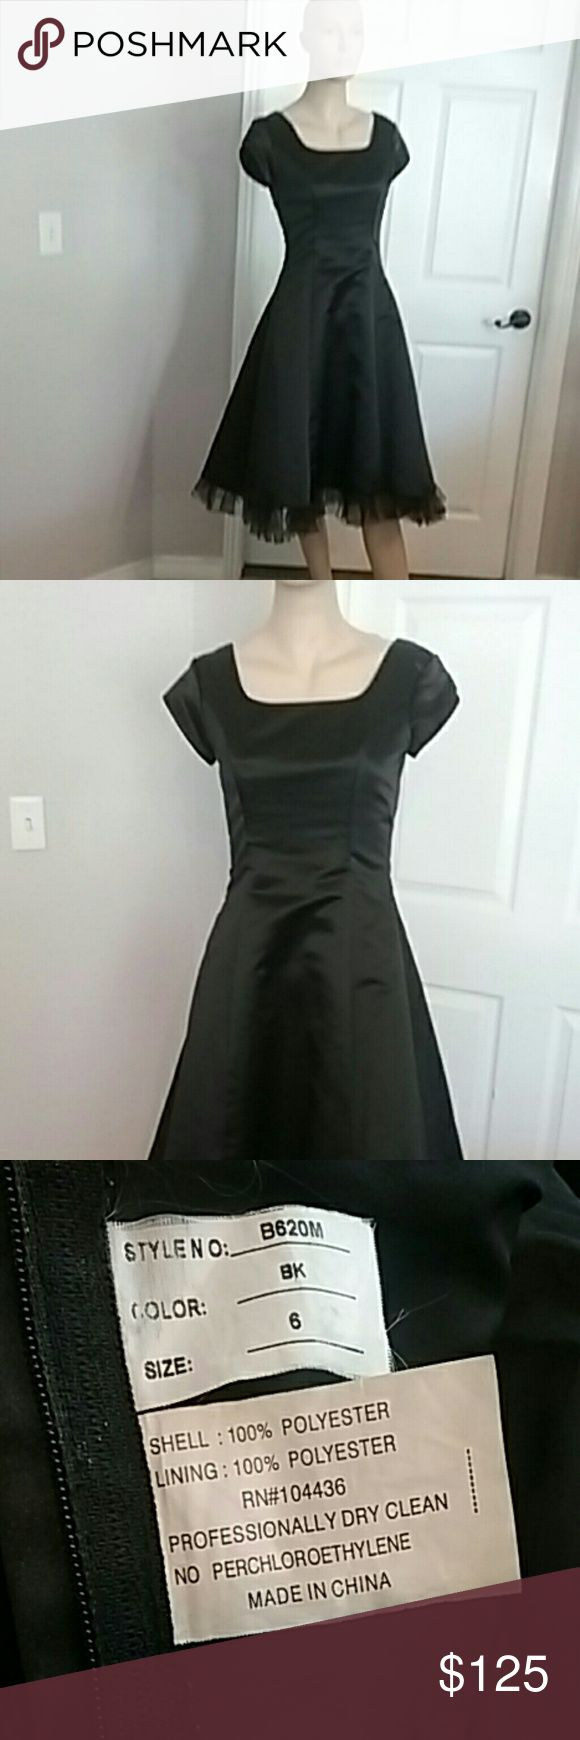 Size 6 Black tea length homecoming dress Modest  size 6 black tea length homecoming, prom, or special occasion dress. Zipper back. Short cap sleeve. Excellent condition. Dresses Prom